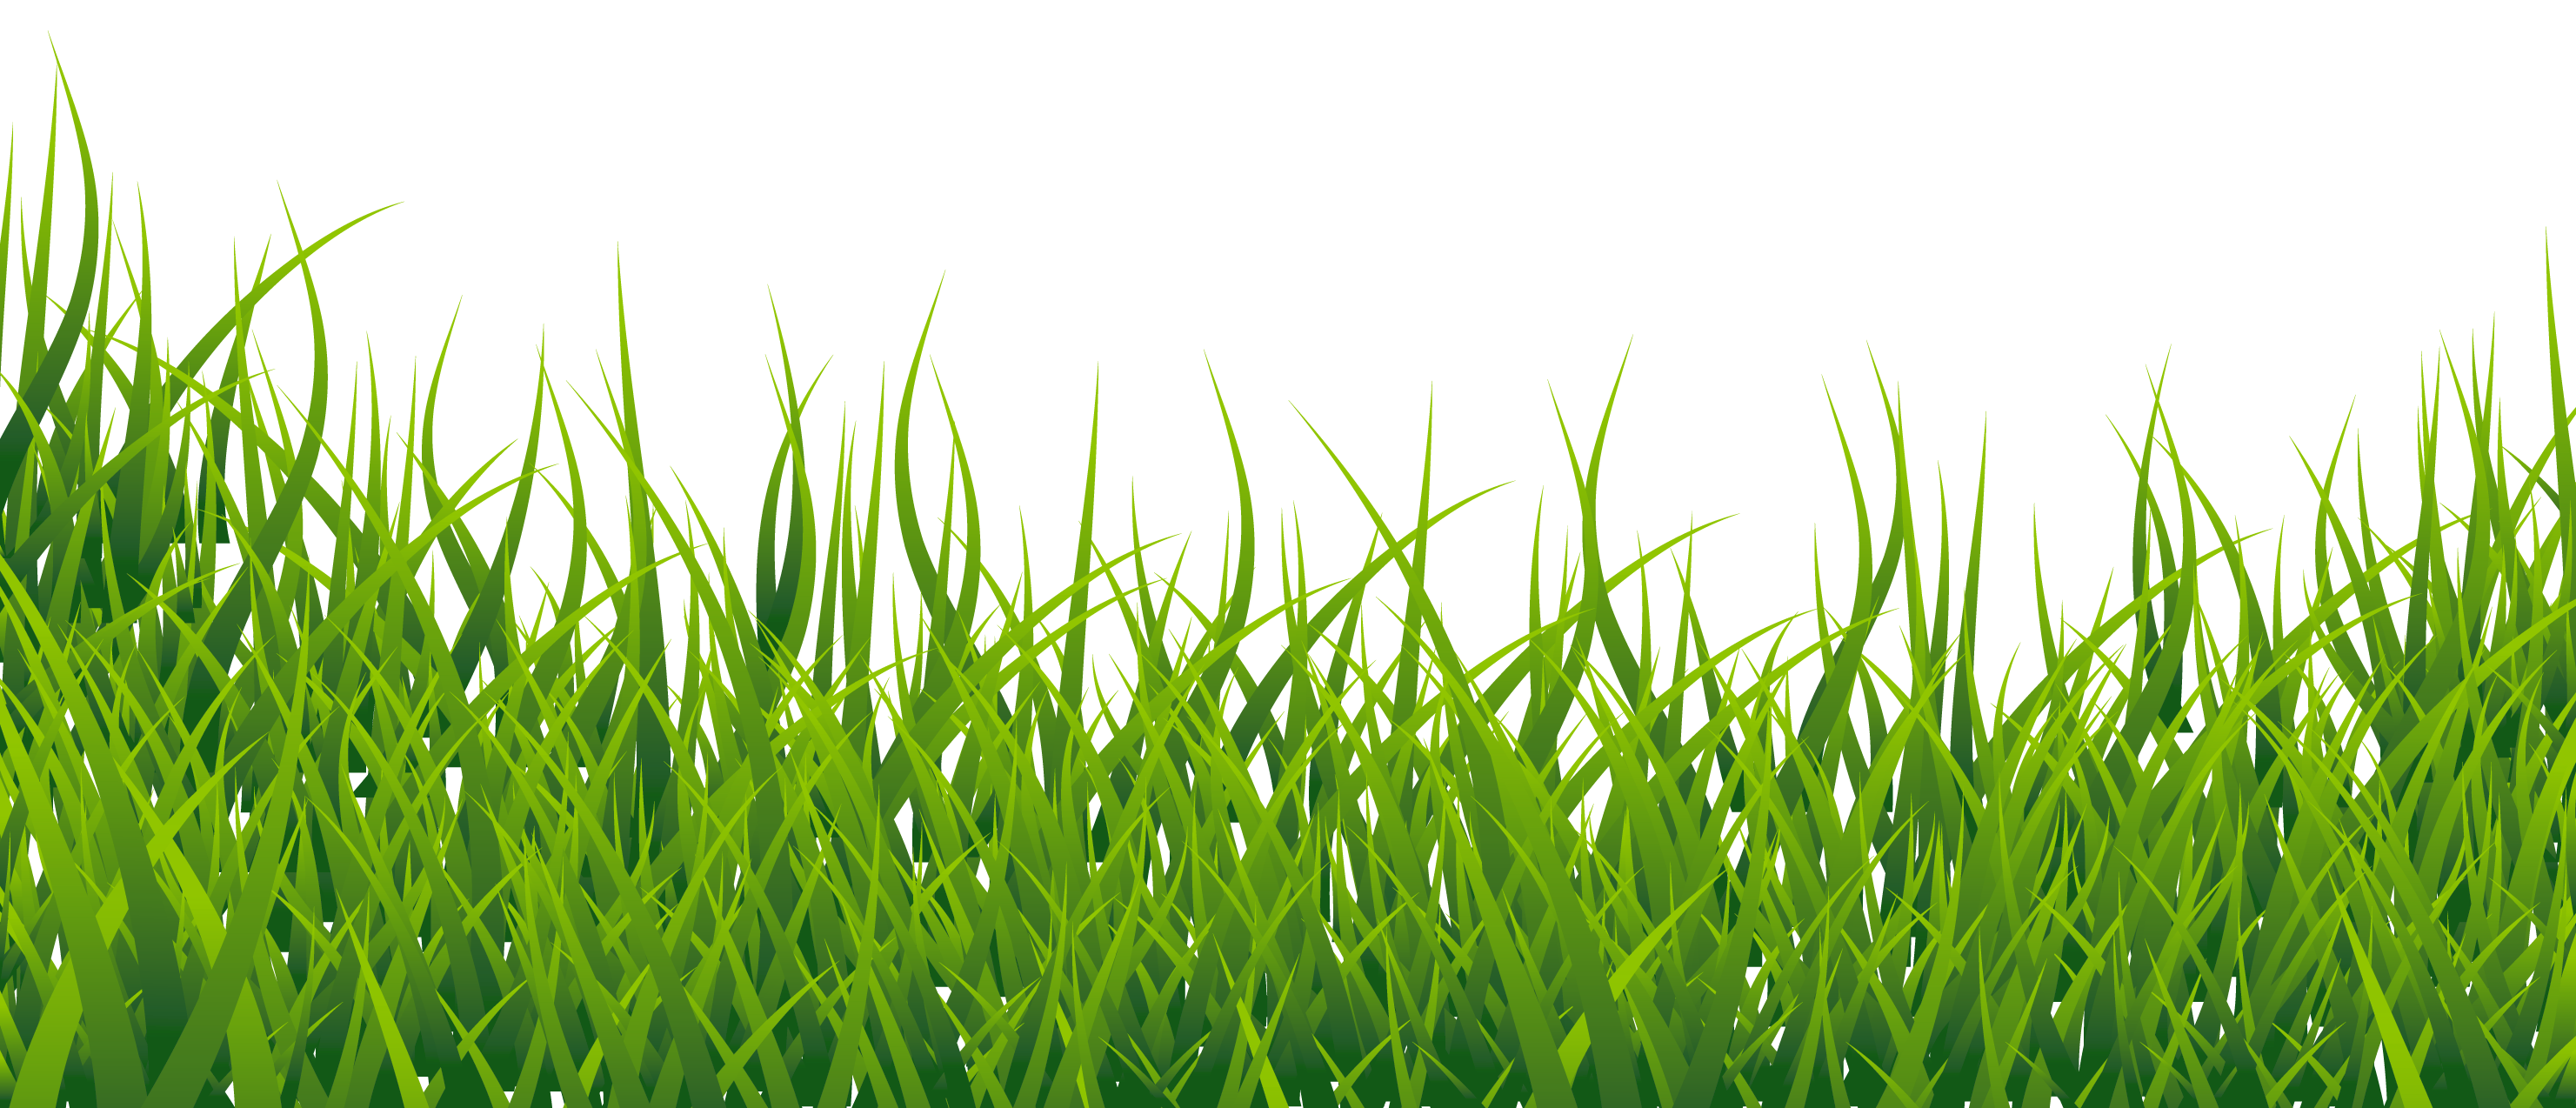 Grass Png Transparent Image - Grass, Transparent background PNG HD thumbnail